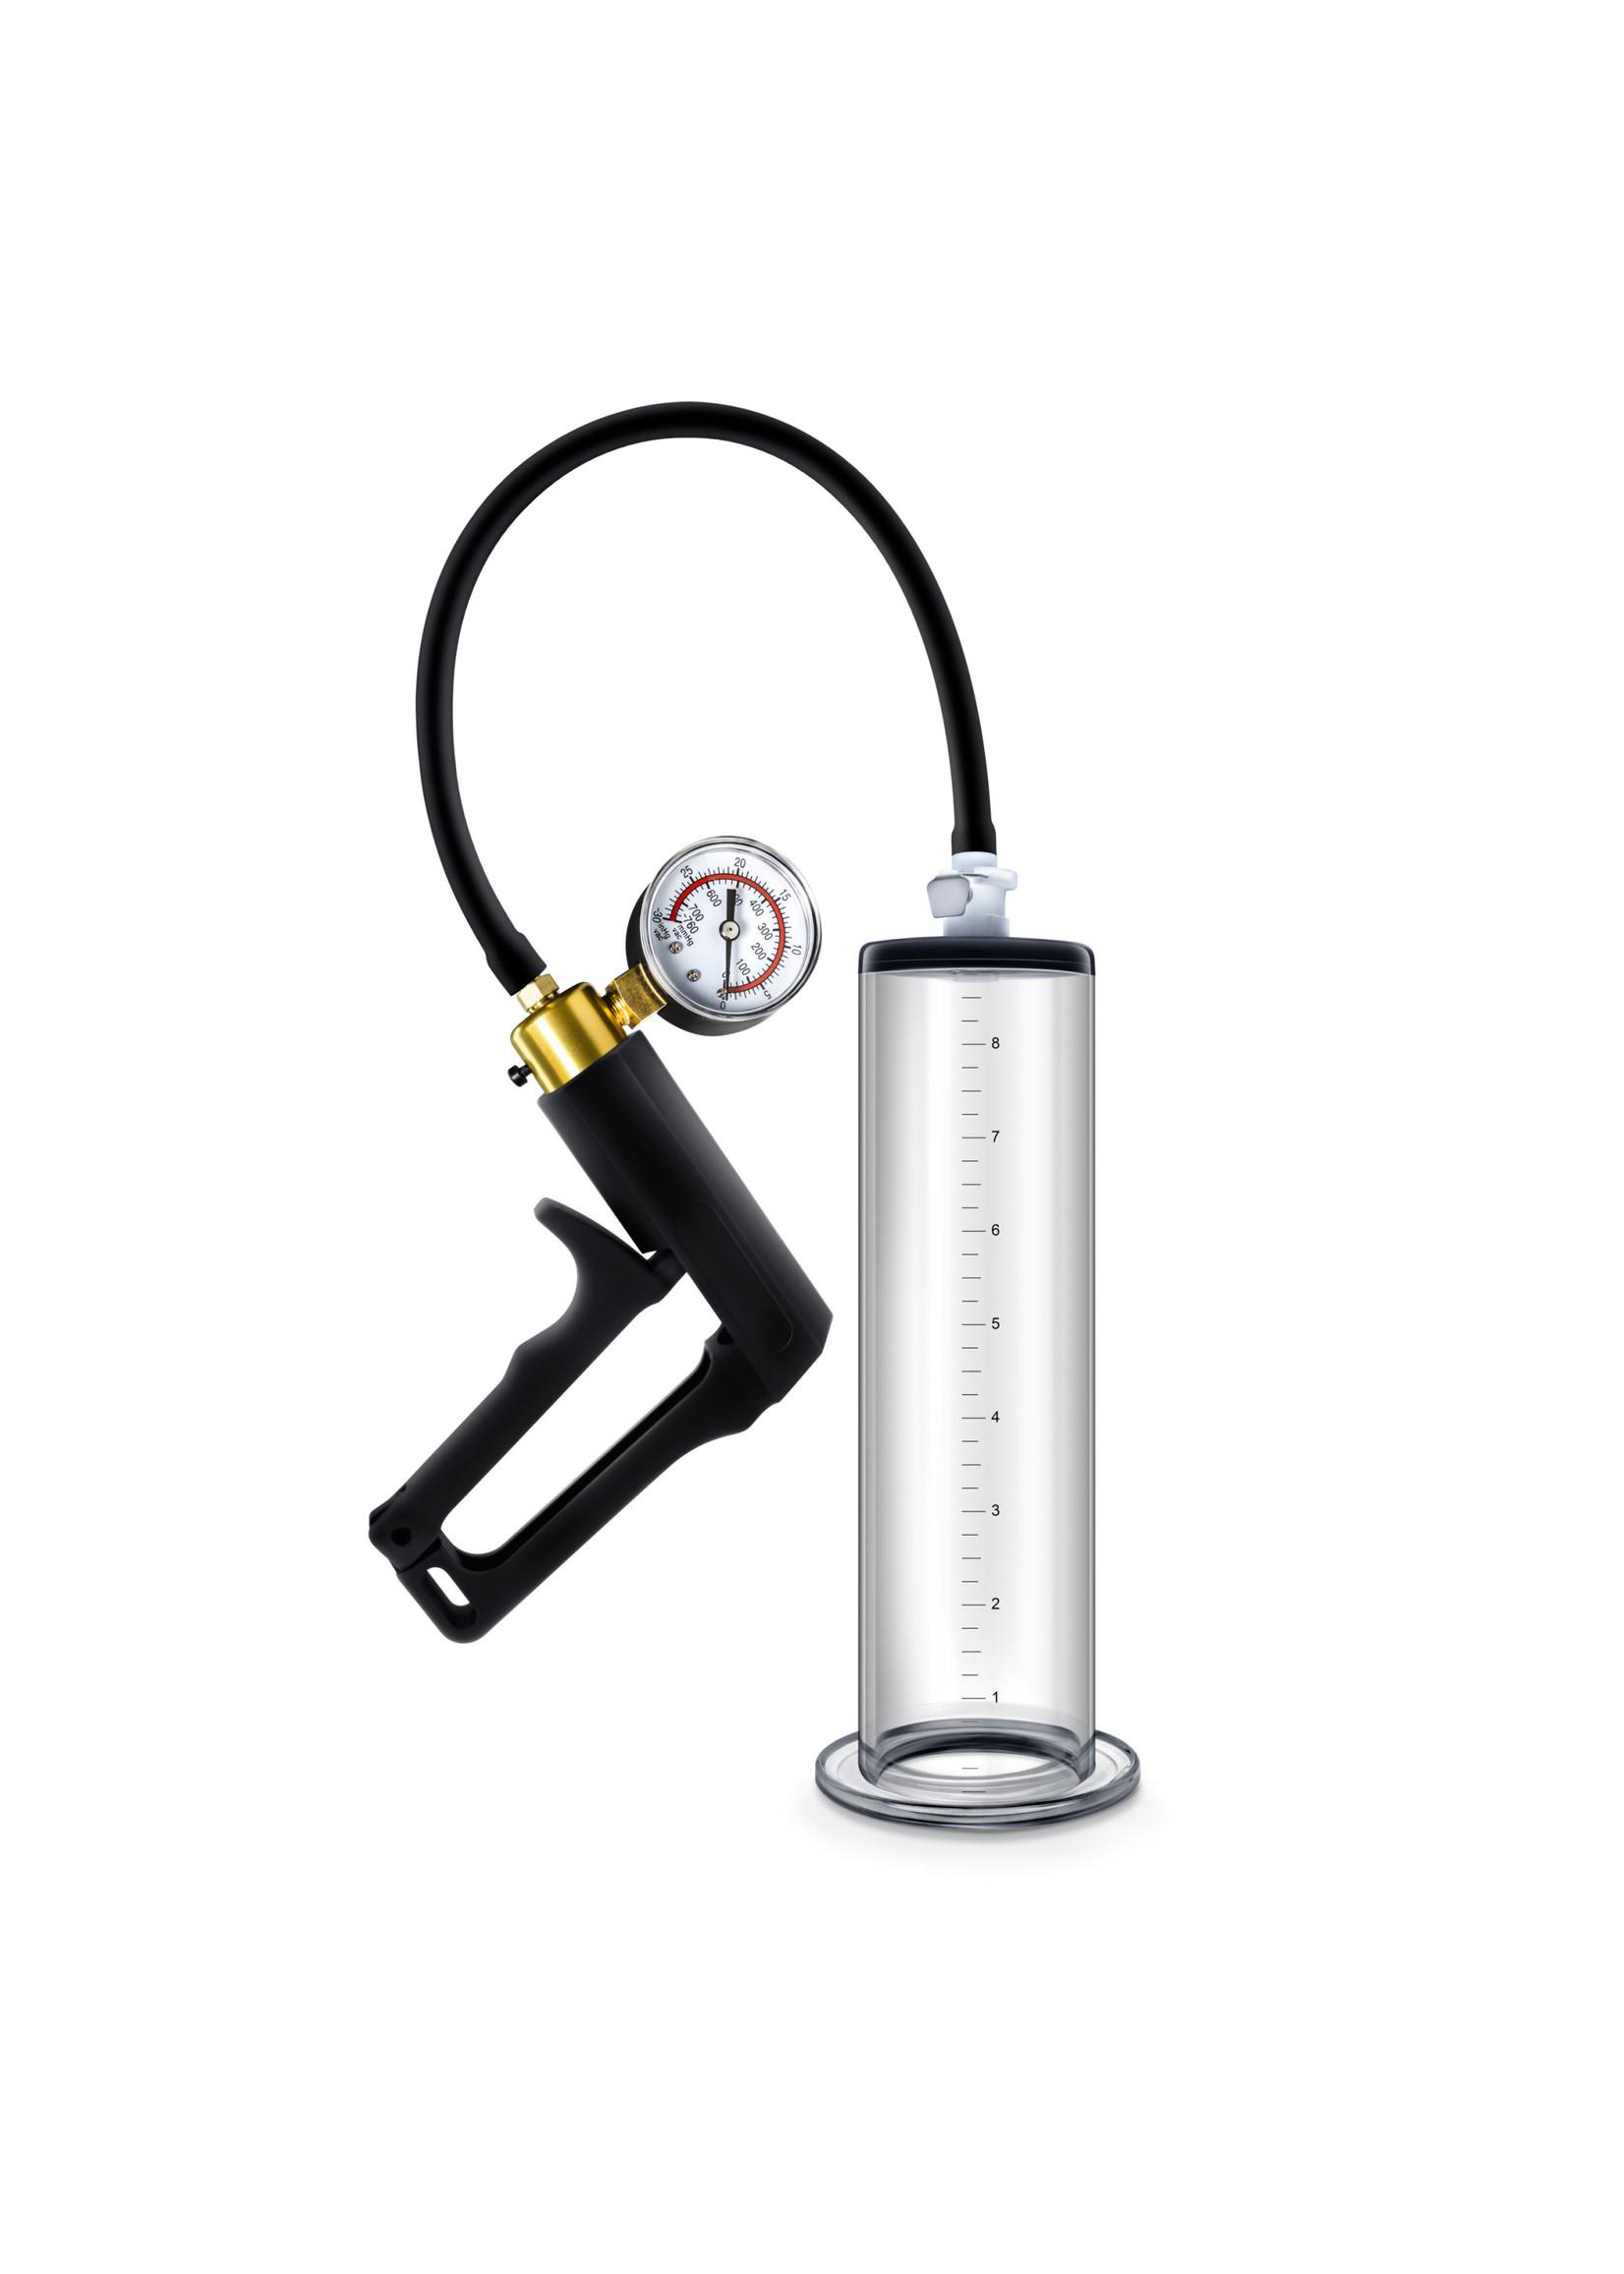 Blush Novelties VX7 Vacuum Trigger Penis Pump